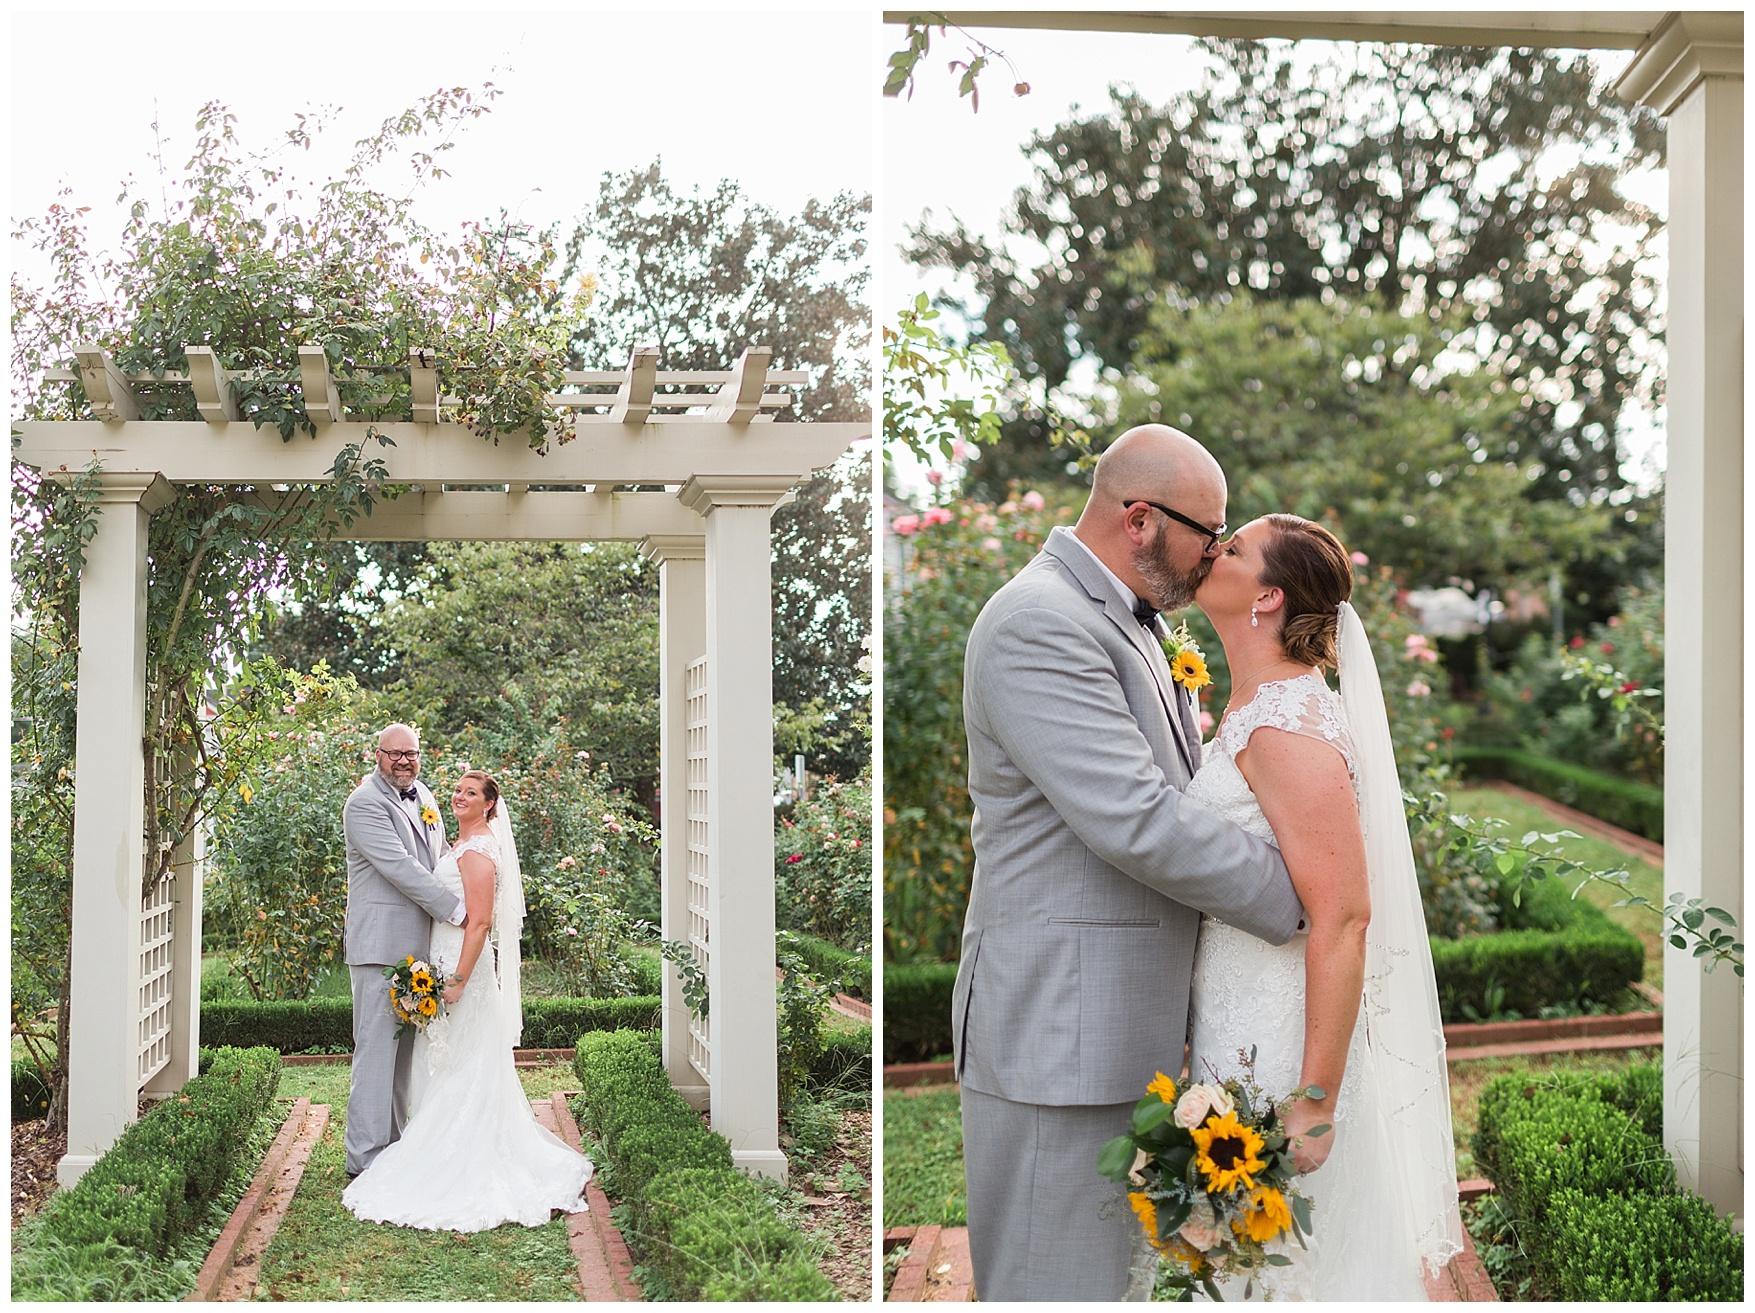 Danville Golf Club Wedding || Danville, Lynchburg, and Charlottesville Wedding Photographer || Fall Wedding in Central Virginia || www.ashleyeiban.com